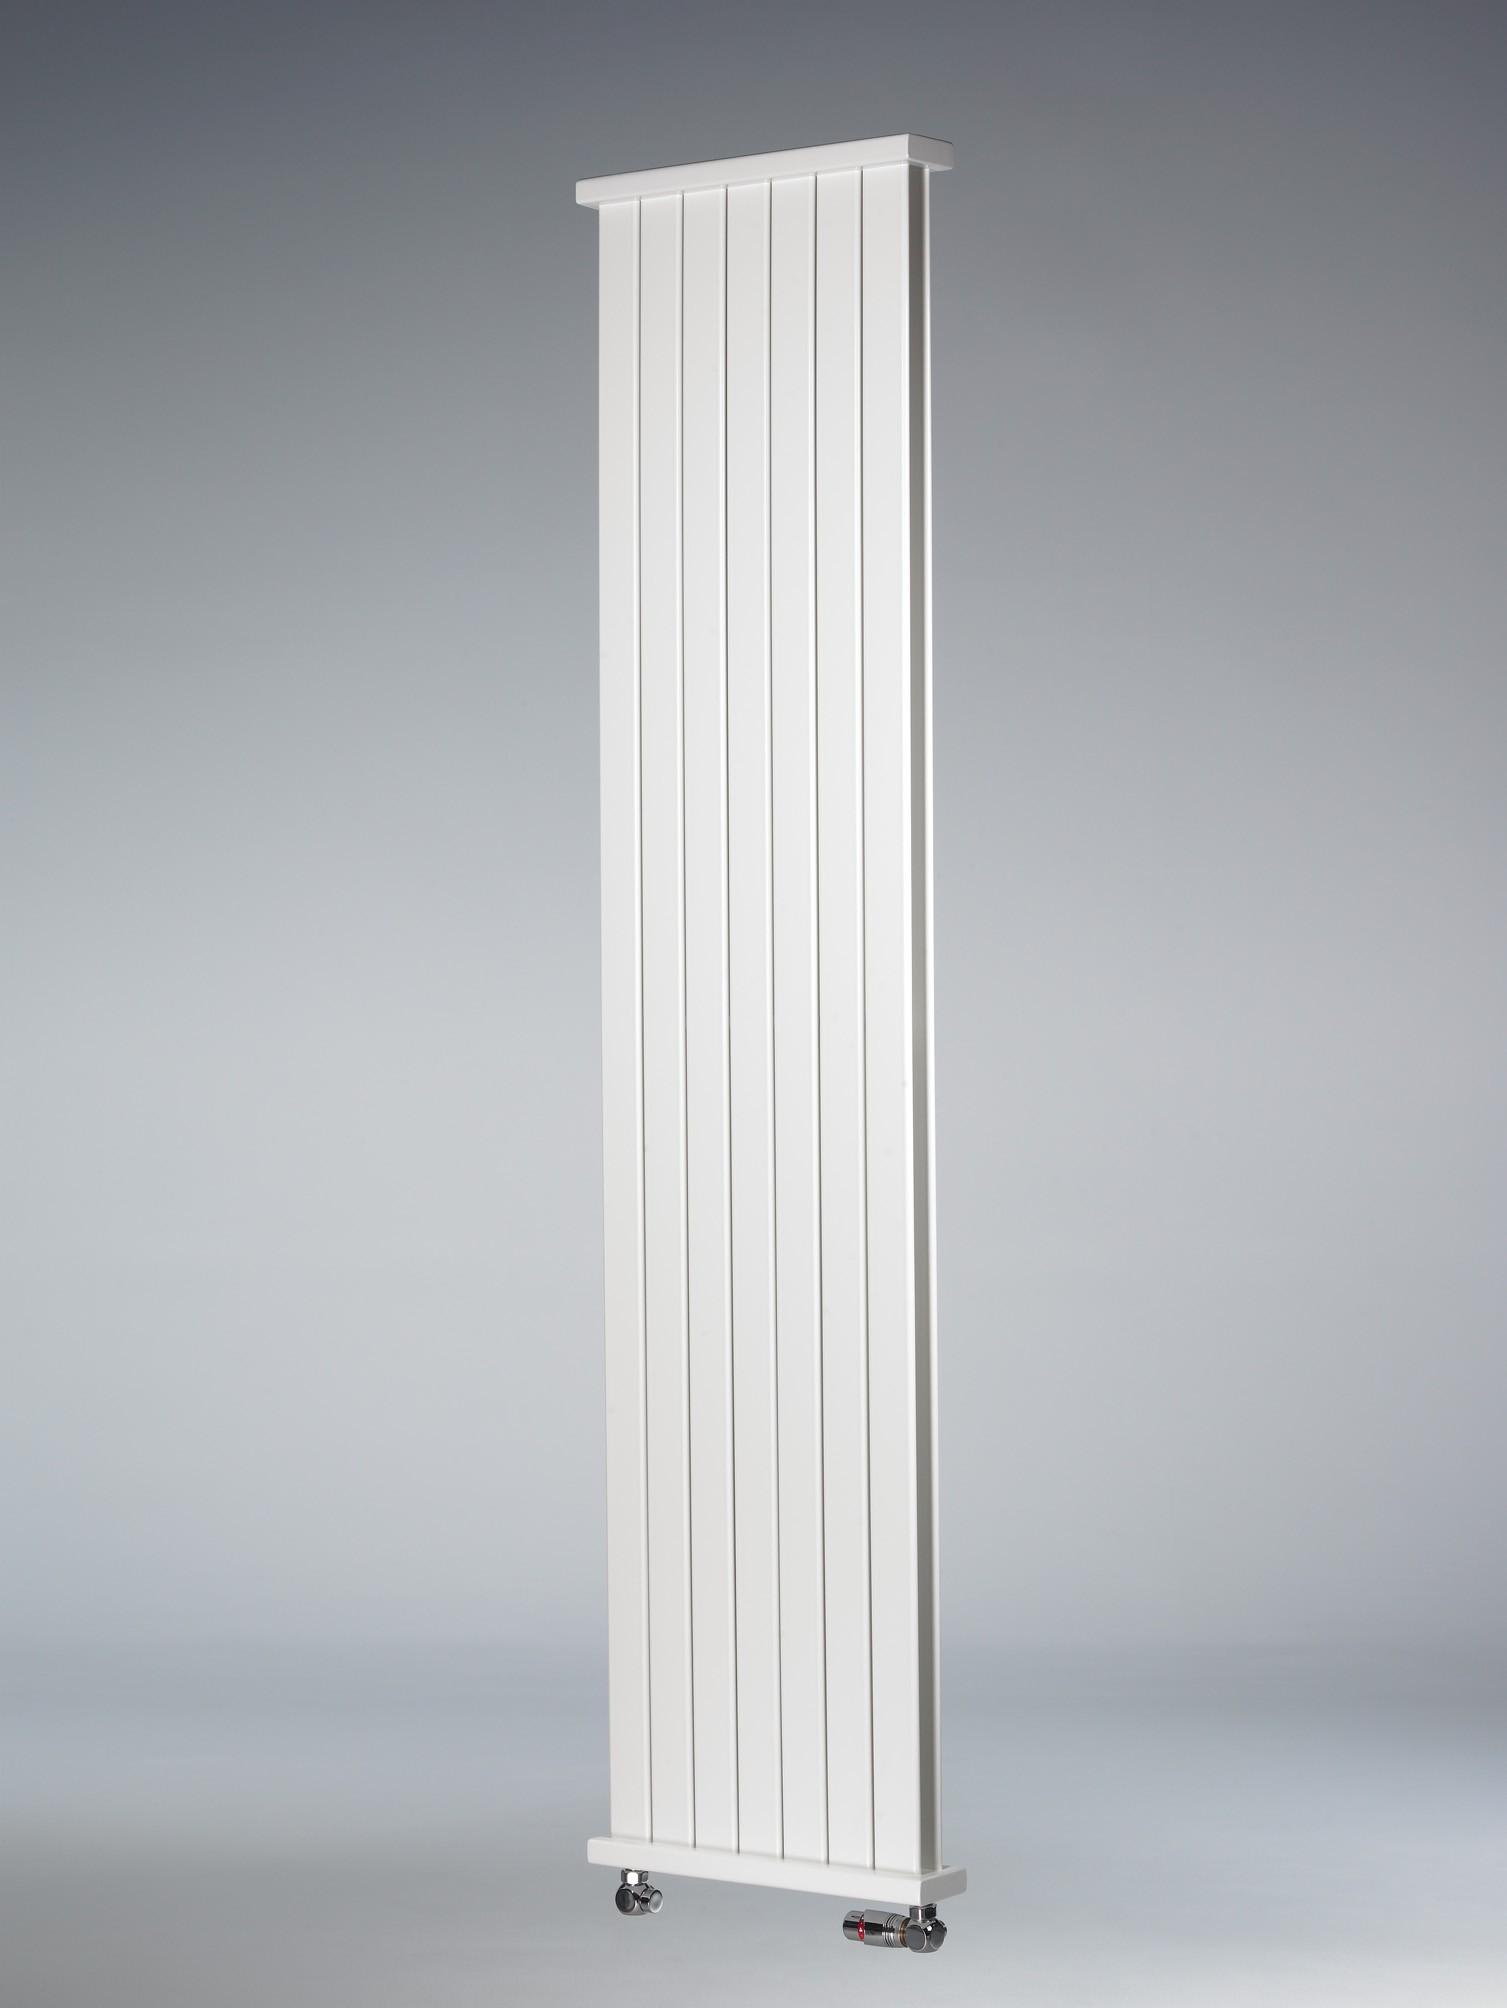 paneelheizk rper 180 x 66 cm 1849 w heizk rper heizk rper. Black Bedroom Furniture Sets. Home Design Ideas